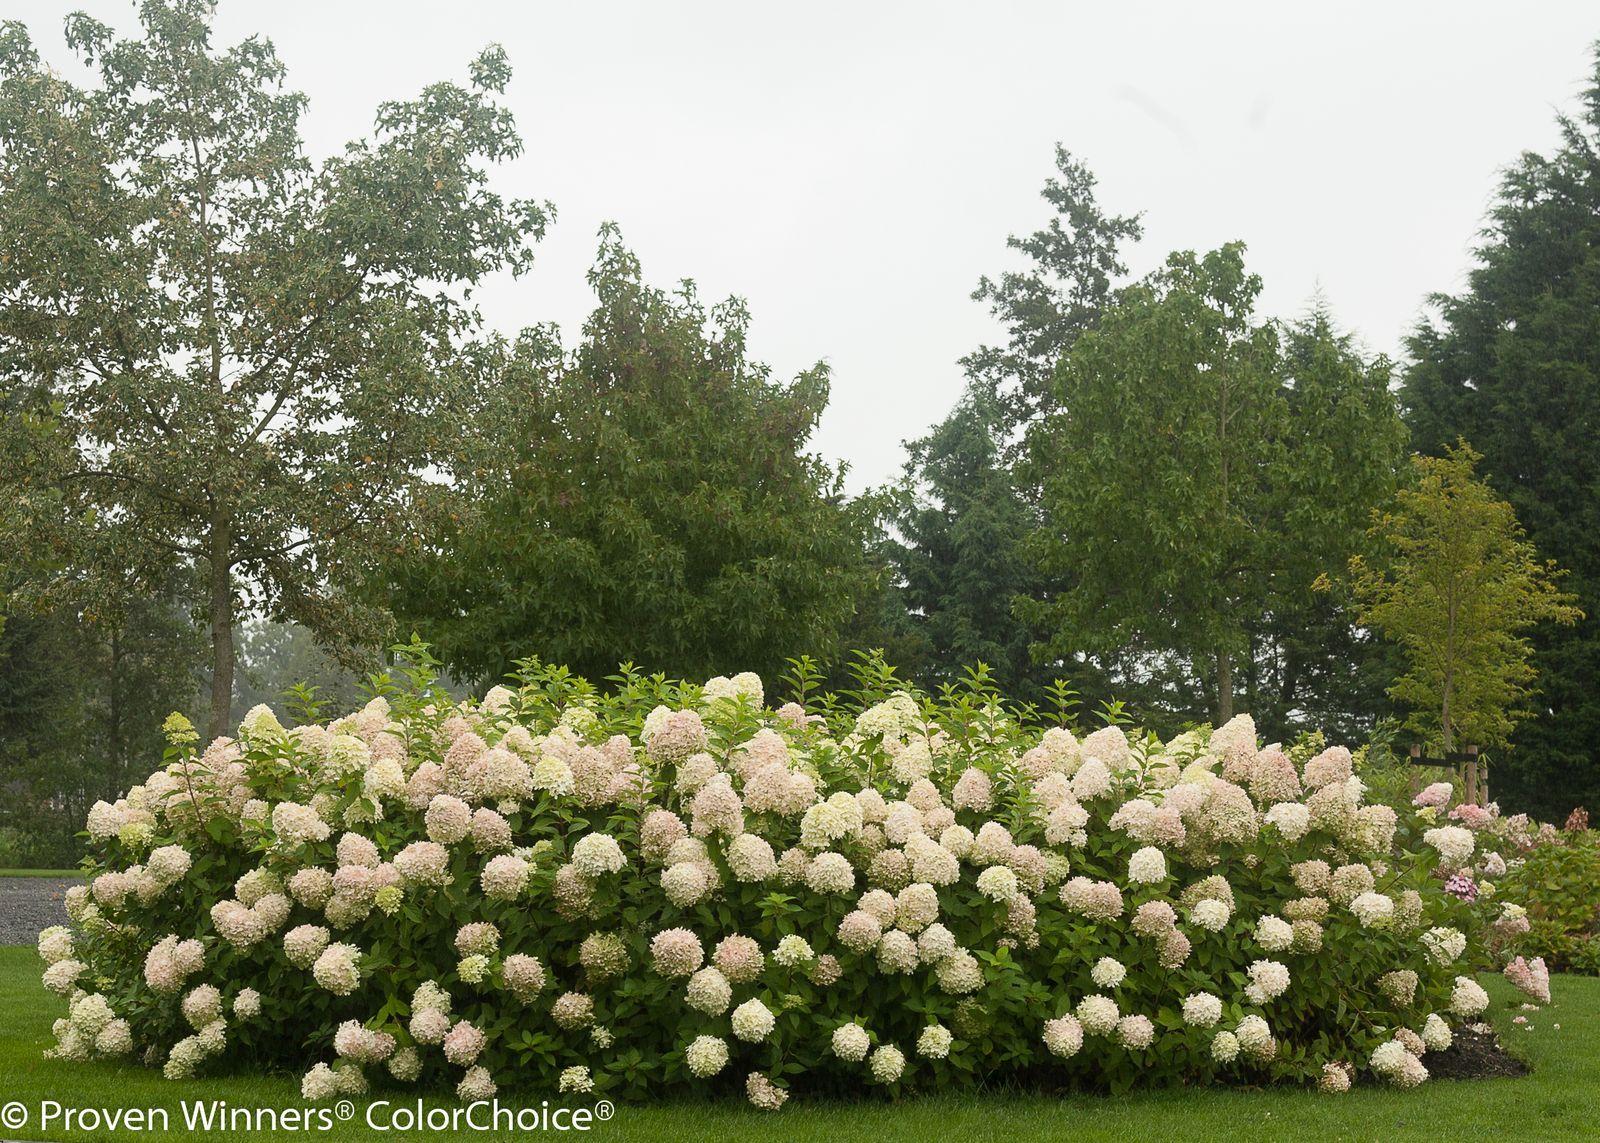 How To Get More Hydrangea Flowers In 2020 Hydrangea Landscaping Hydrangea Garden Hydrangea Shade